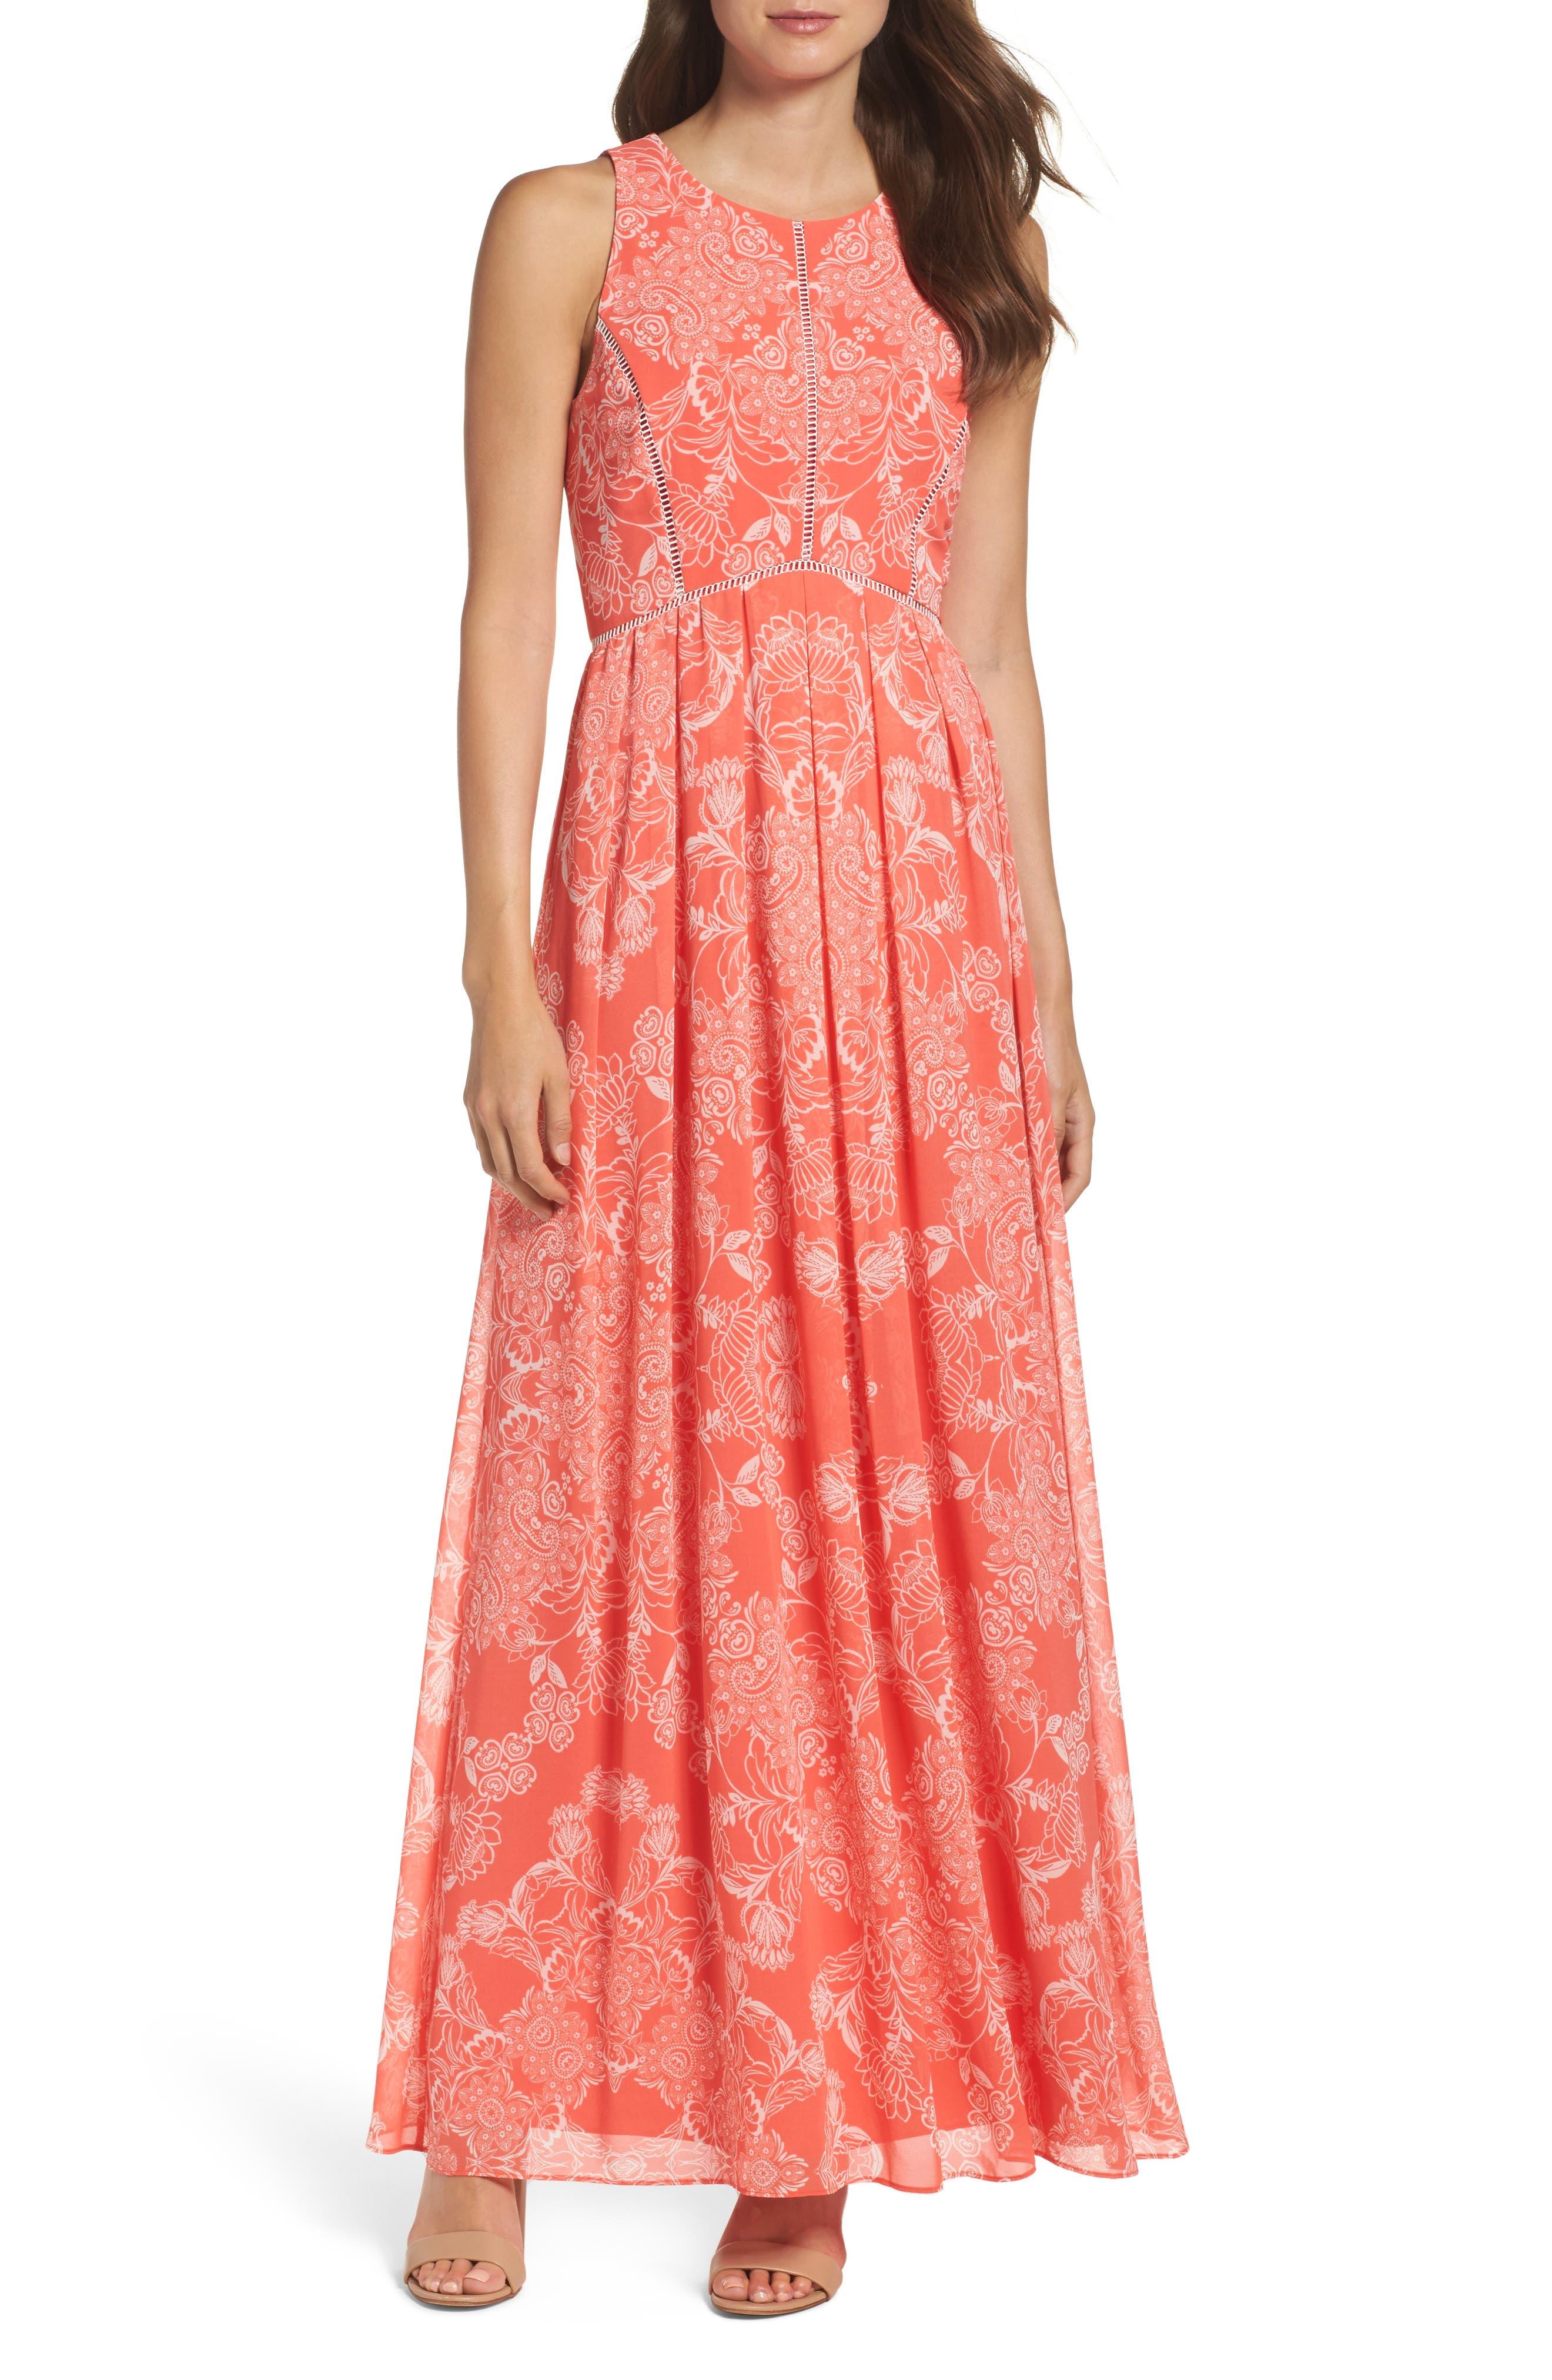 Alternate Image 1 Selected - Vince Camuto Chiffon Maxi Dress (Regular & Petite)